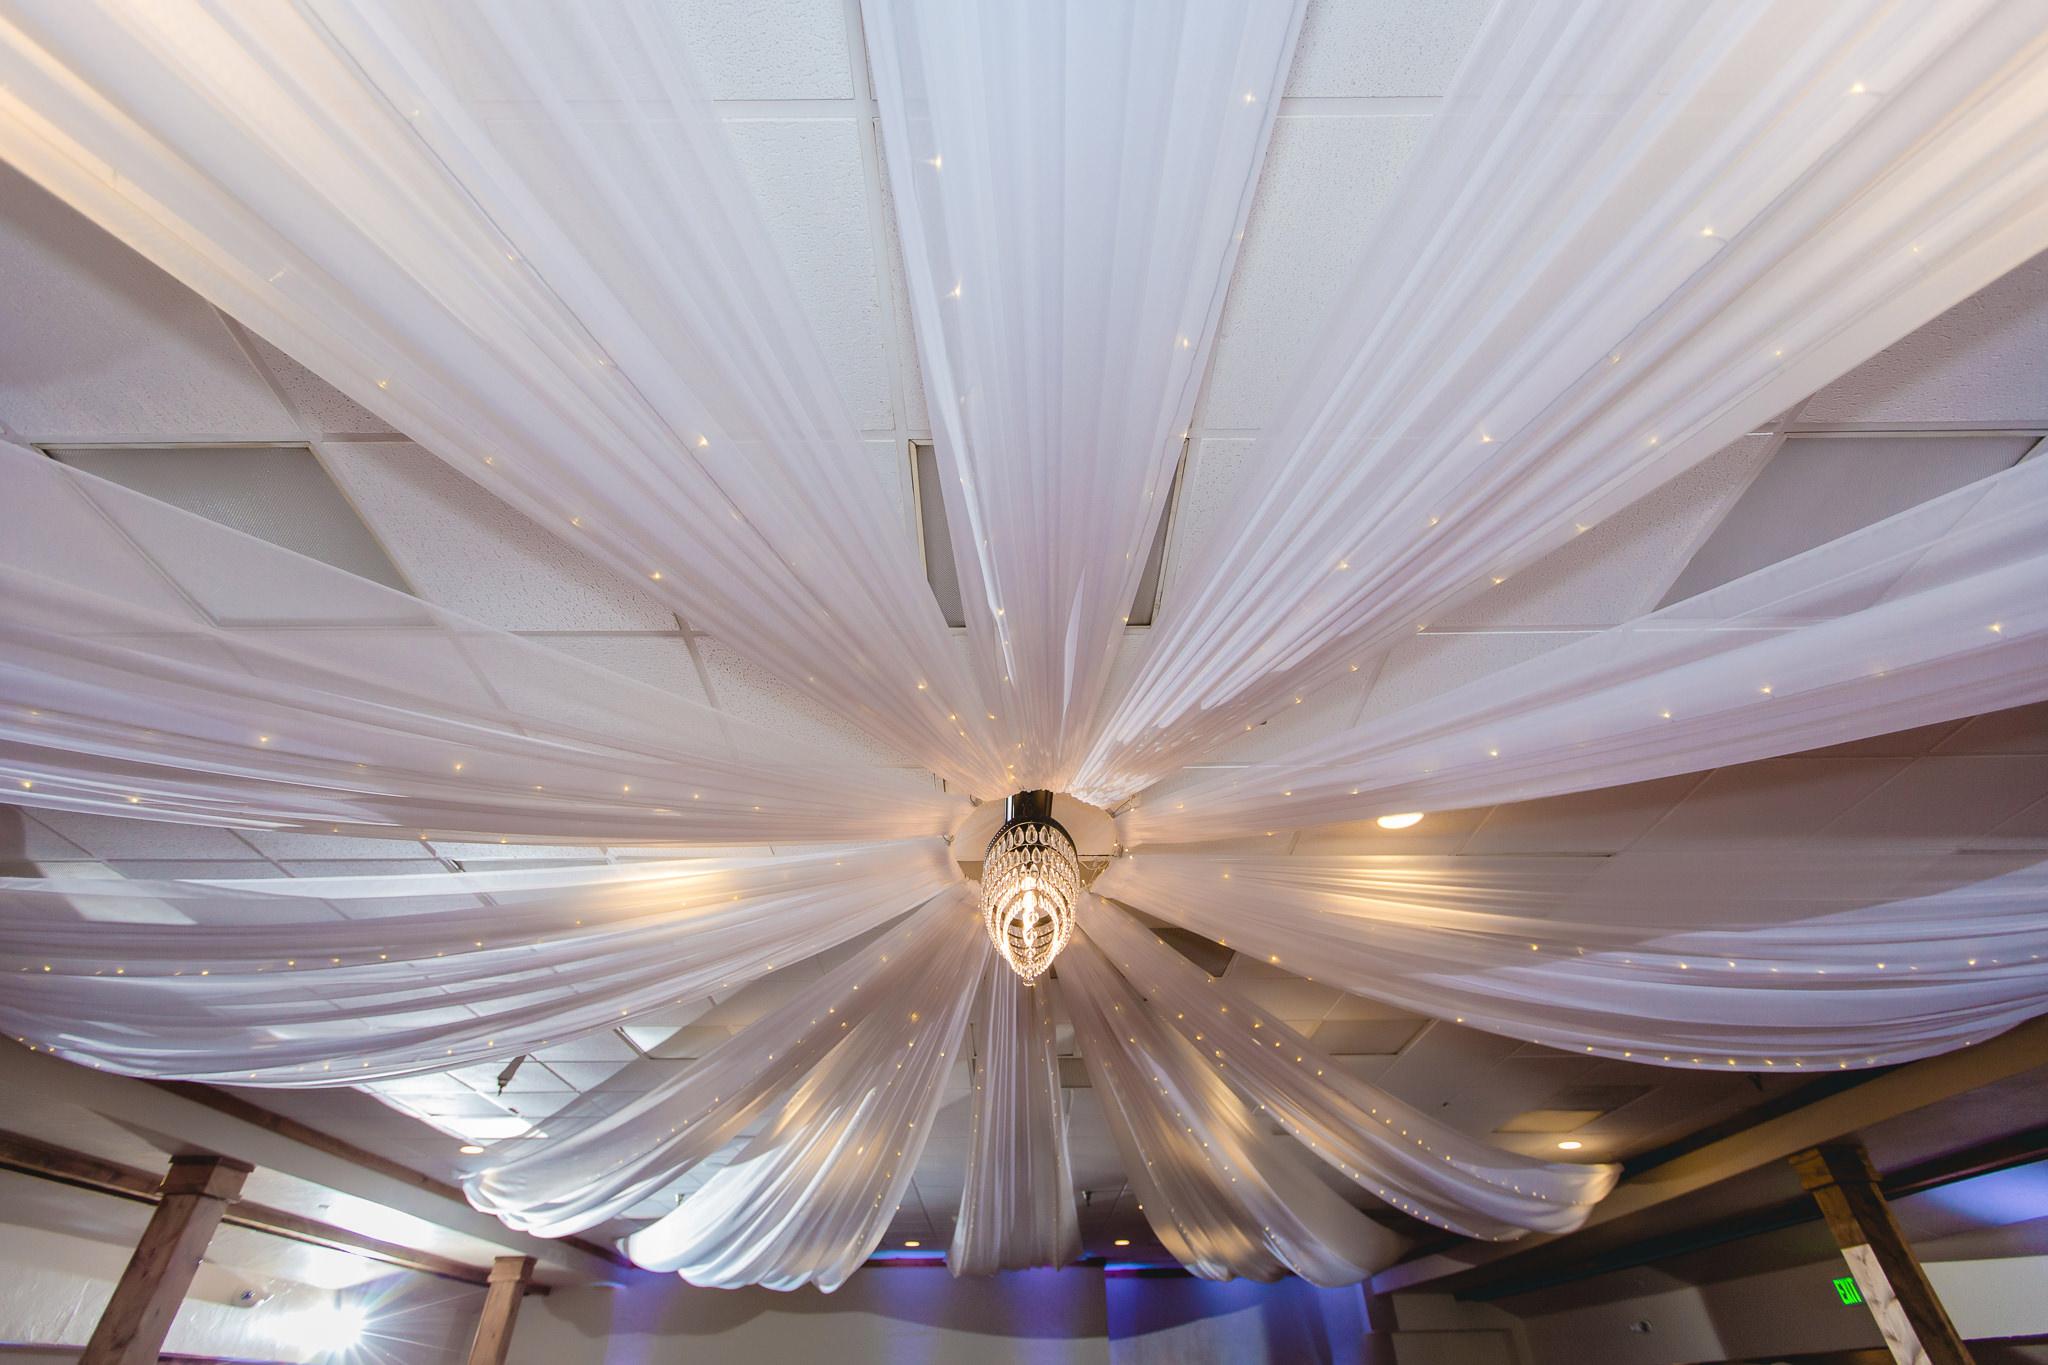 Ribbon streams from the chandelier at Hidden Valley Resort